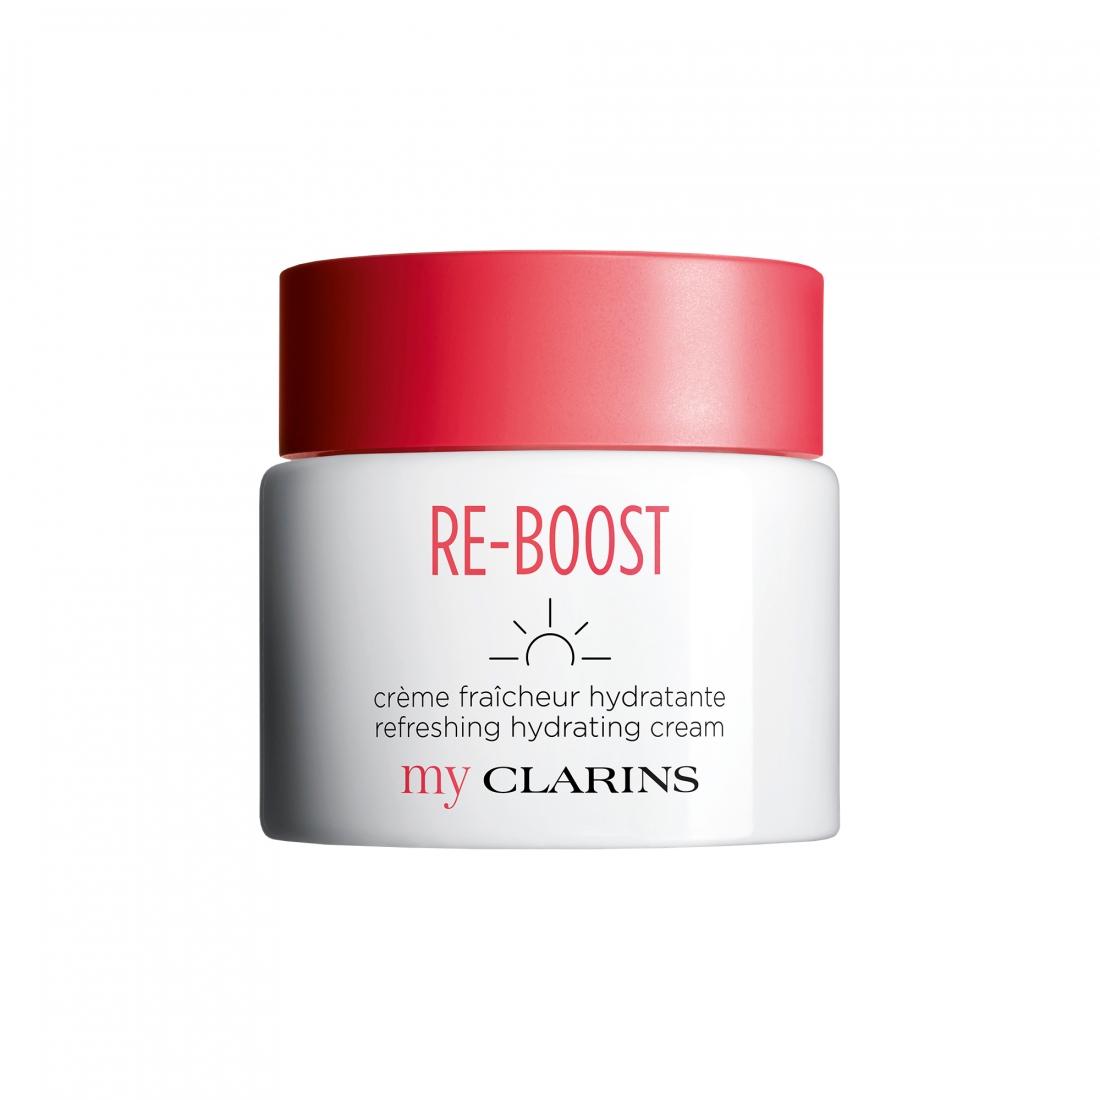 My Clarins Re-Boost Refreshing Hydrating Cream 50 ml